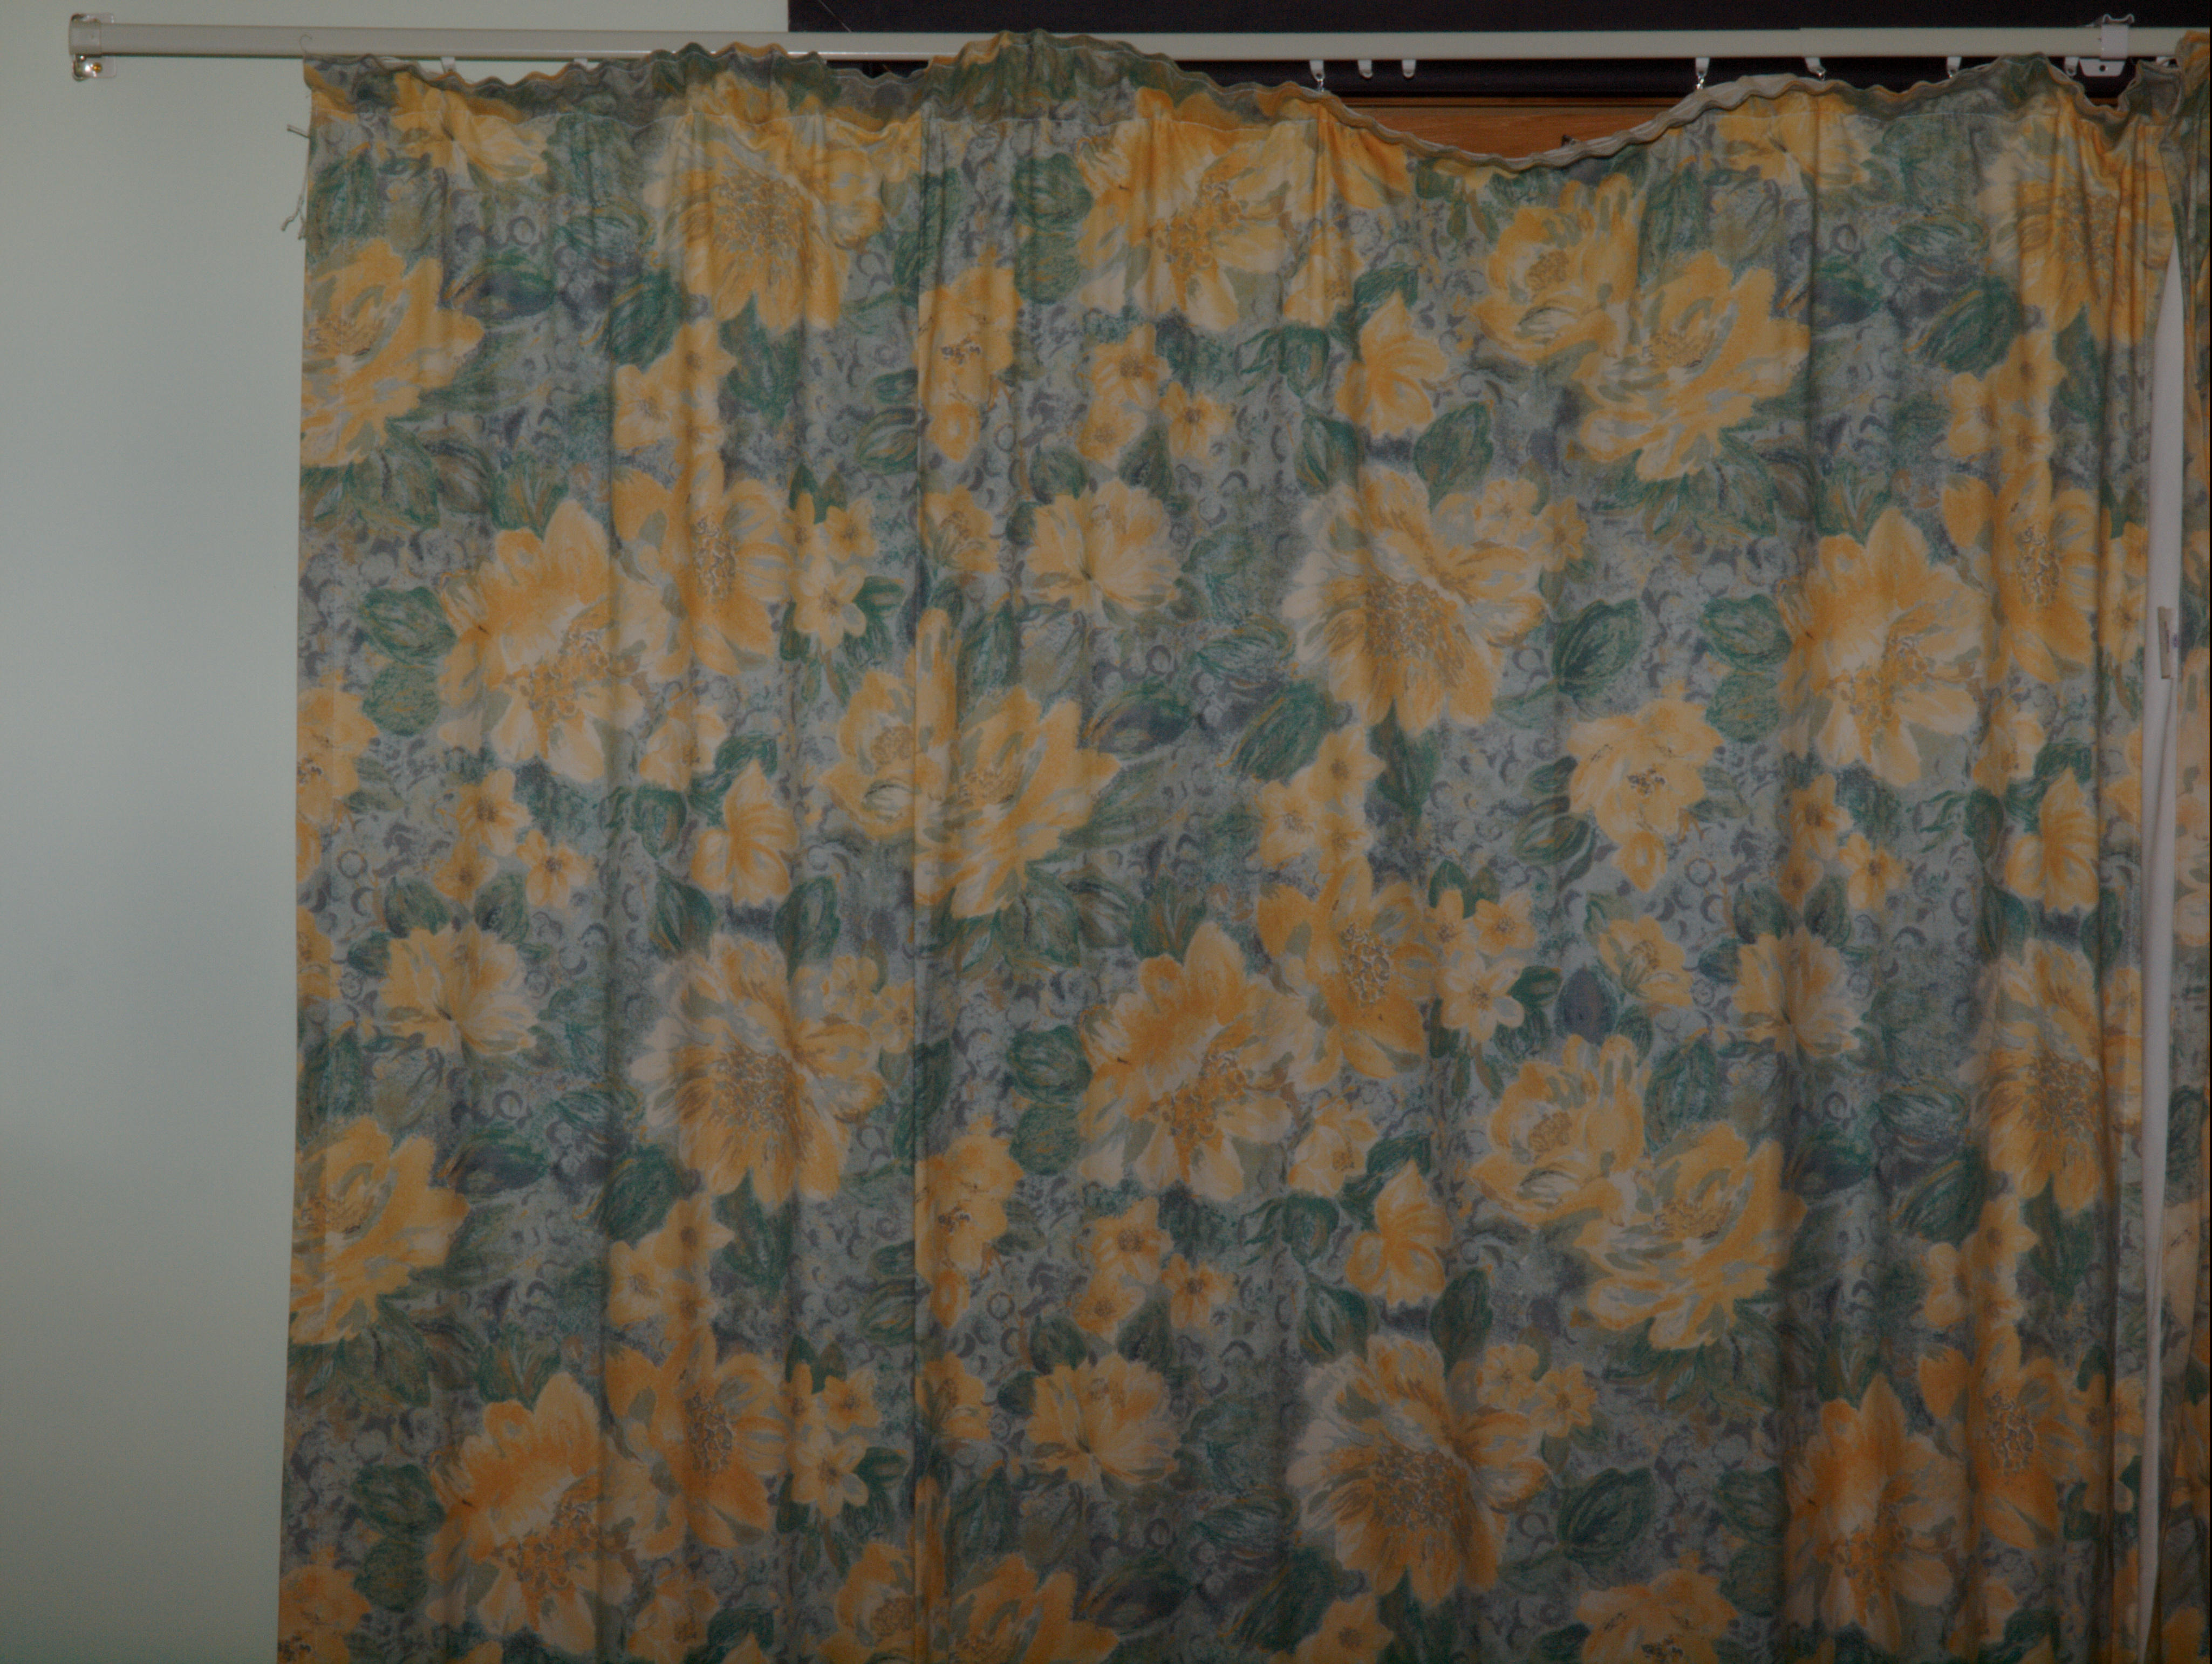 Curtains-250-22.jpeg